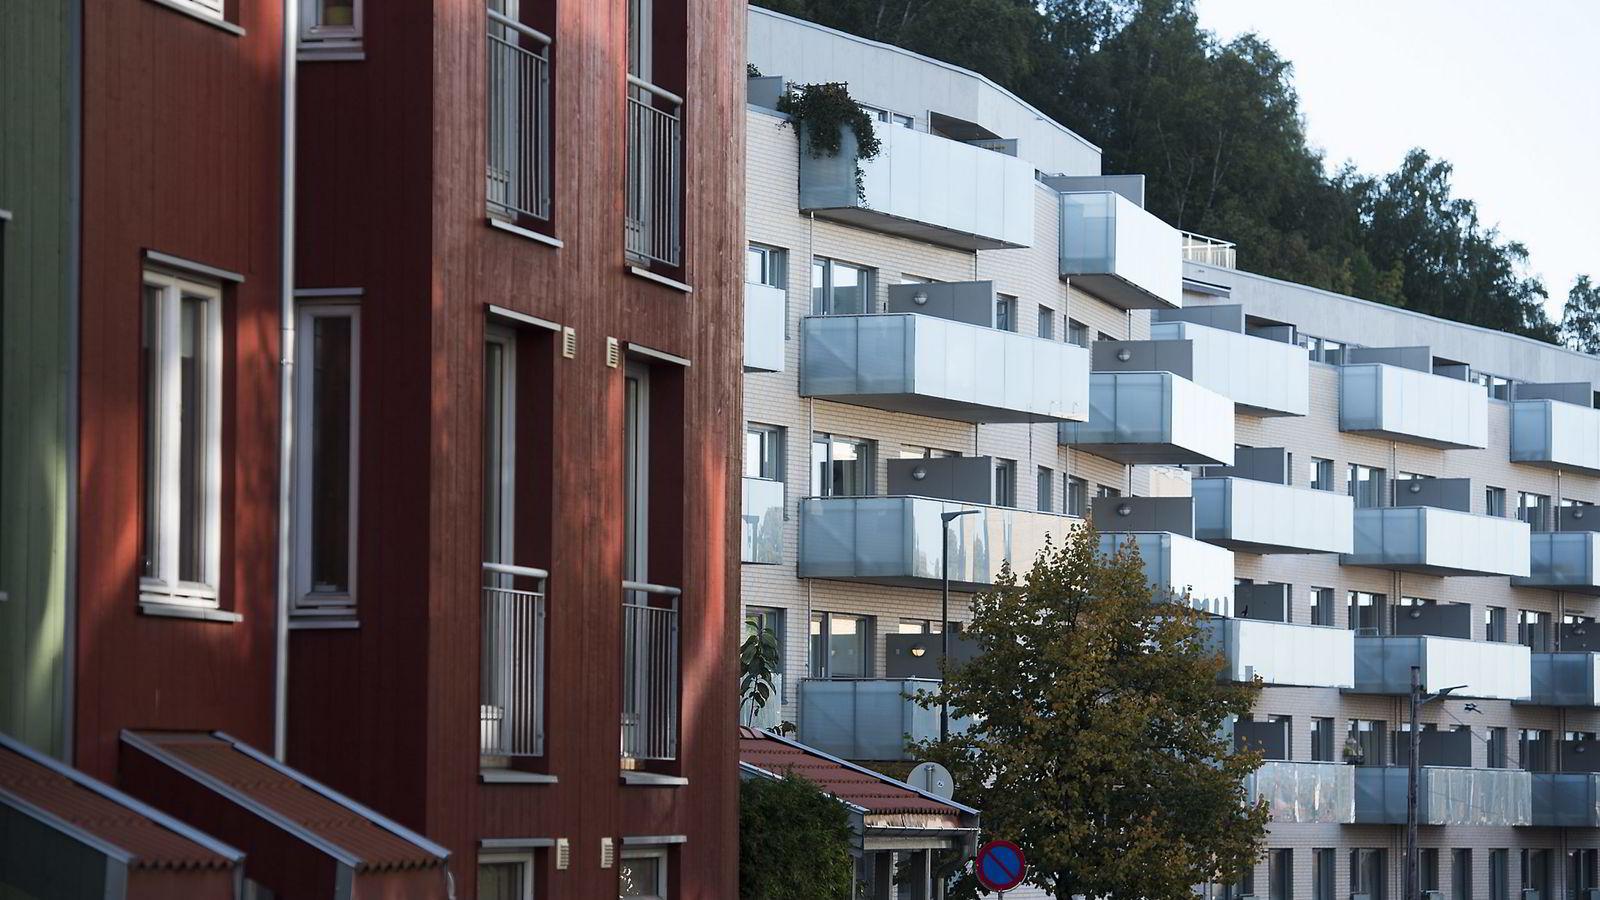 Det er enorme krefter som virker i boligmarkedet nå, og eventuell boligmangel behøver ikke engang være med i ligningen, sier forfatteren.